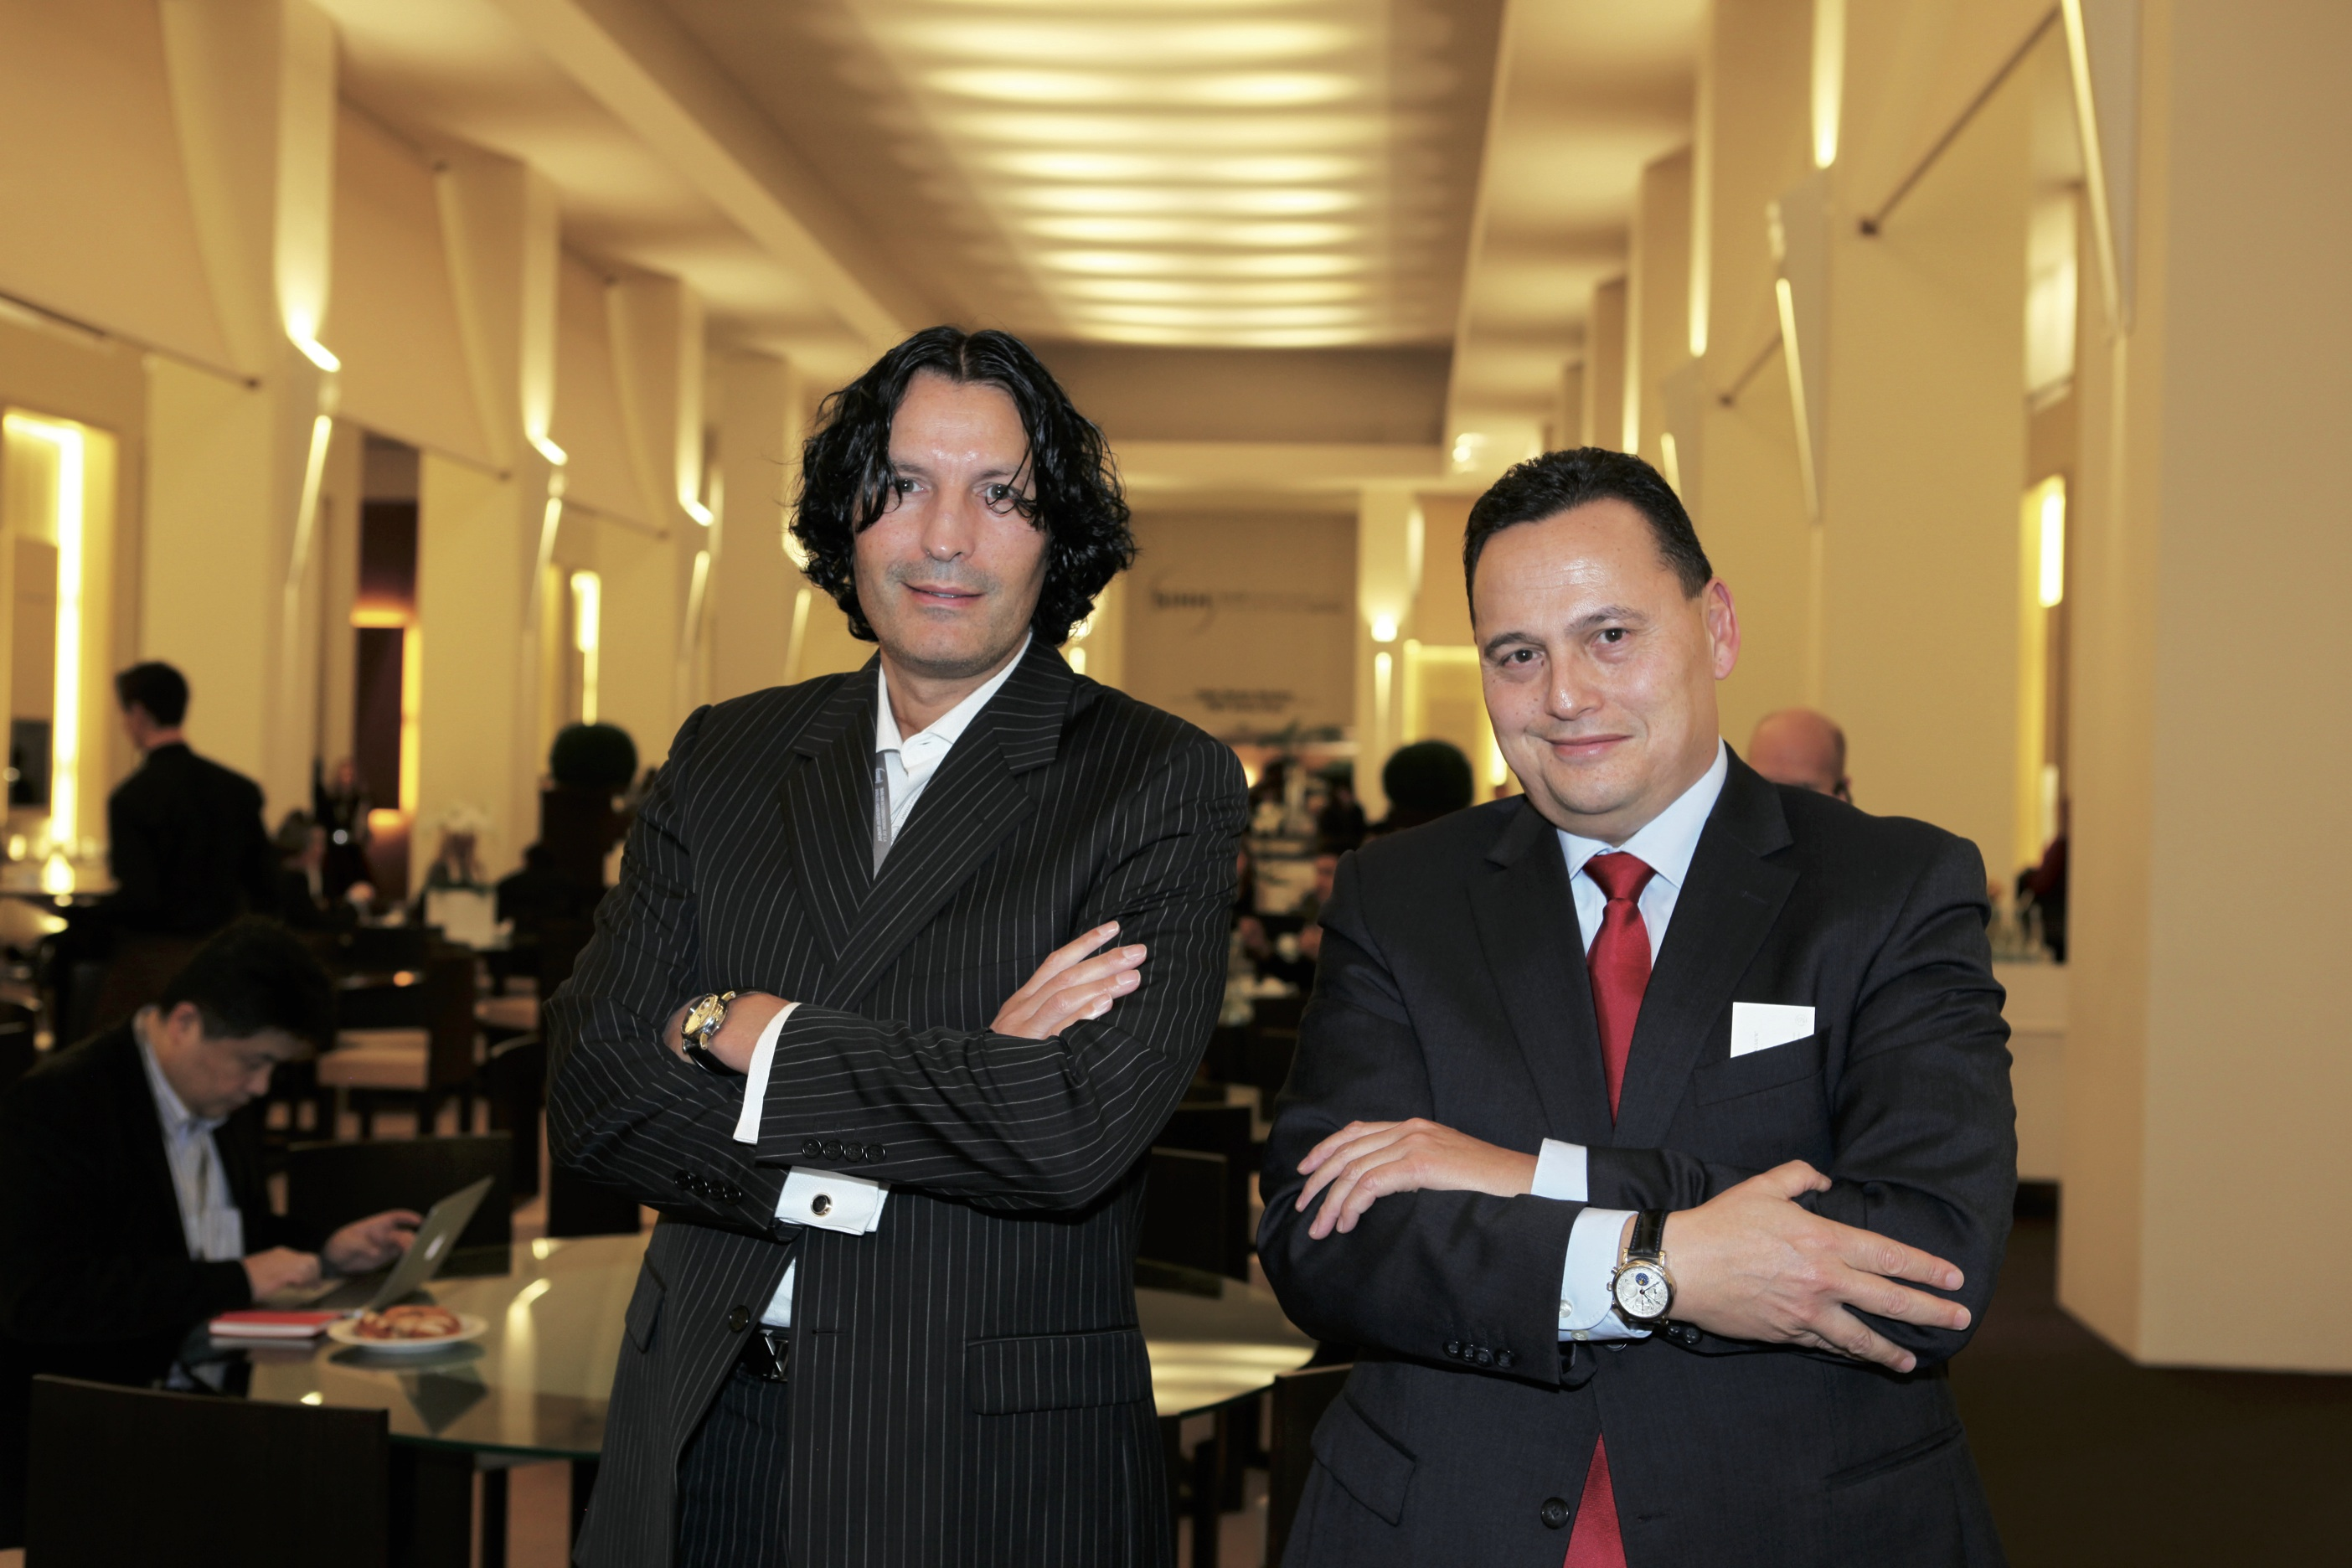 Daniël Reintjes and Maurice Doppert,  Christian van der klaauw.